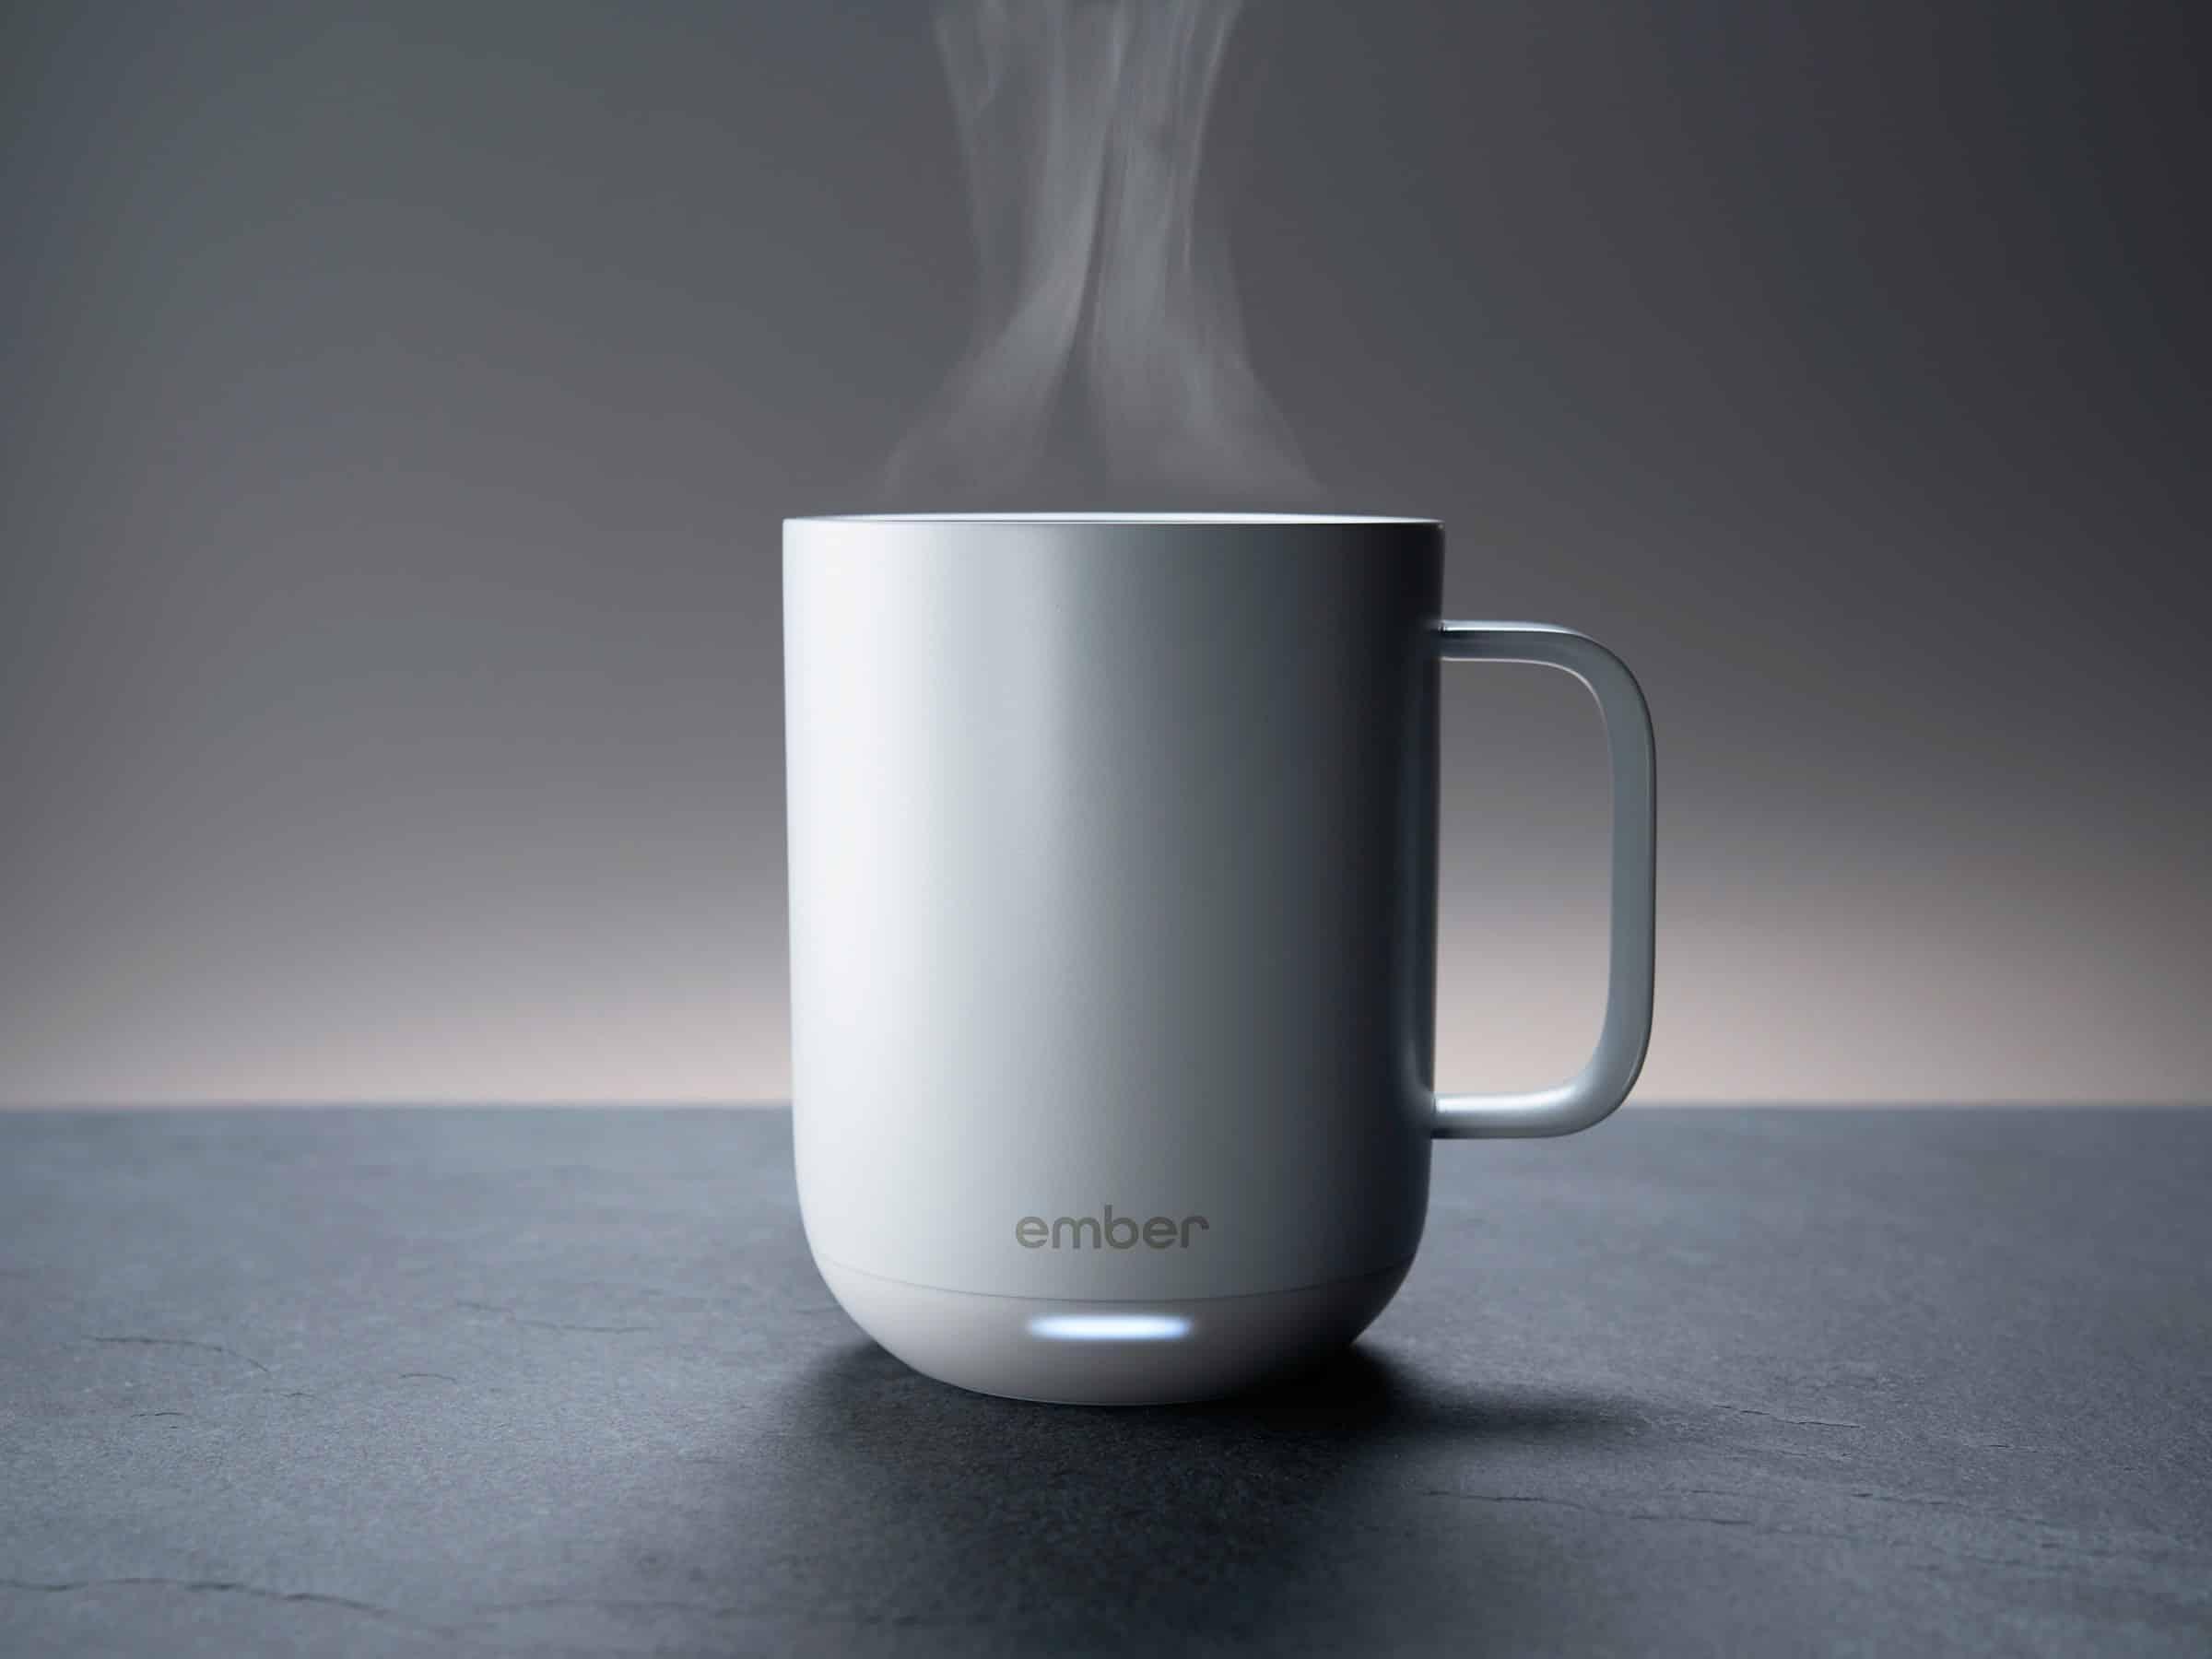 Ember - Temperature Control Ceramic Mug